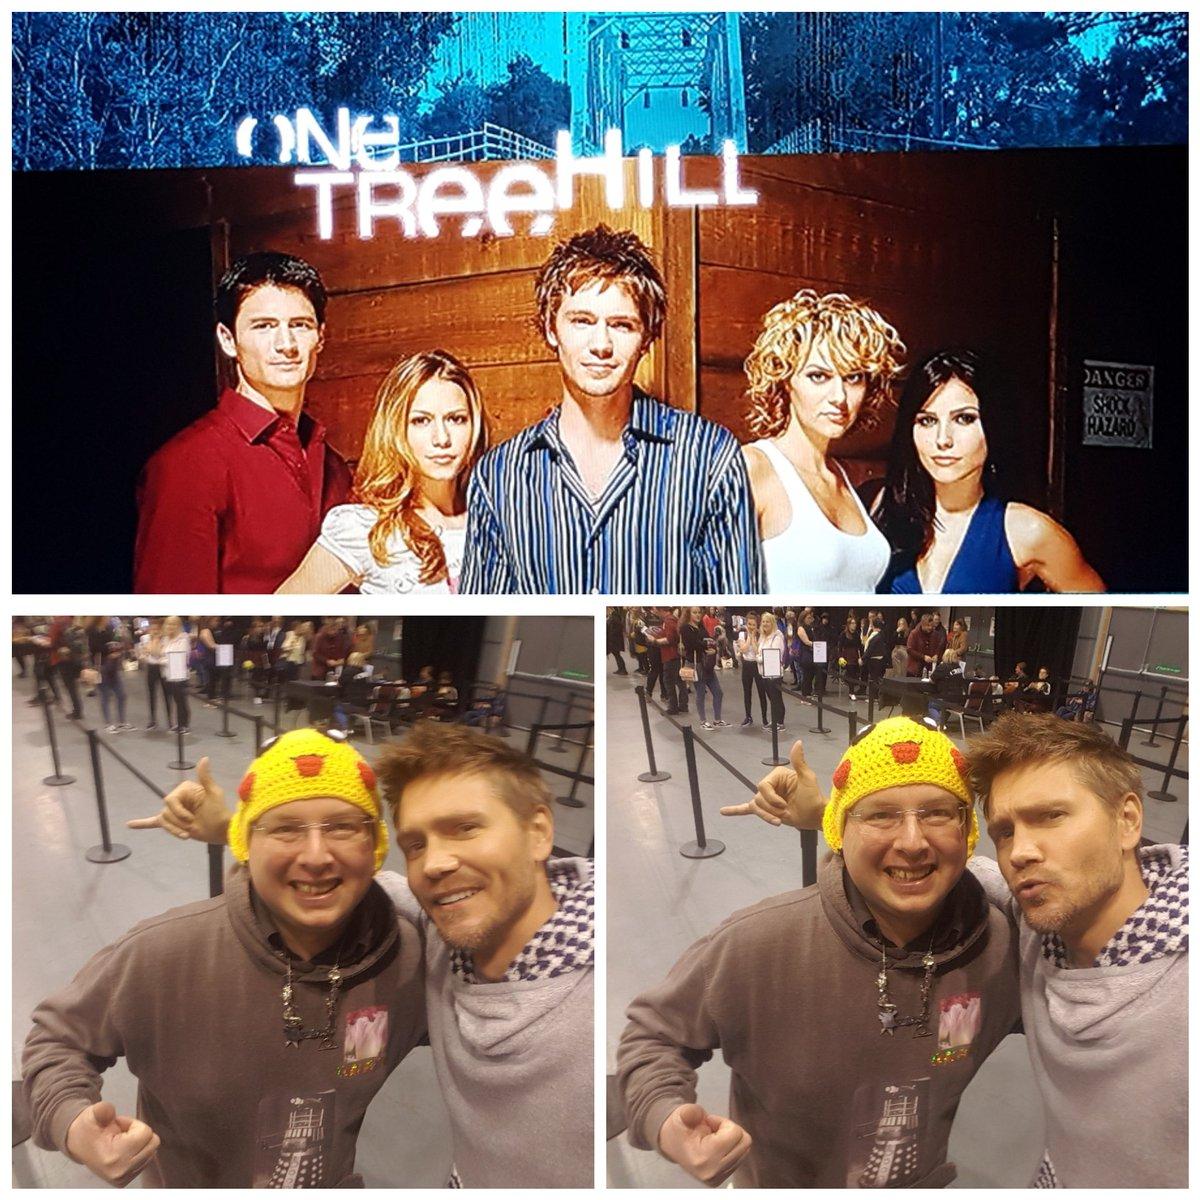 My One Tree Hill Rewatch  Has Reached The  Amazing Series 3.   A Fantastic Series#OneTreeHill @ChadMMurray @ThisIsLafferty @SophiaBush @HilarieBurton @BethanyJoyLenz pic.twitter.com/tdxkiOrfgo